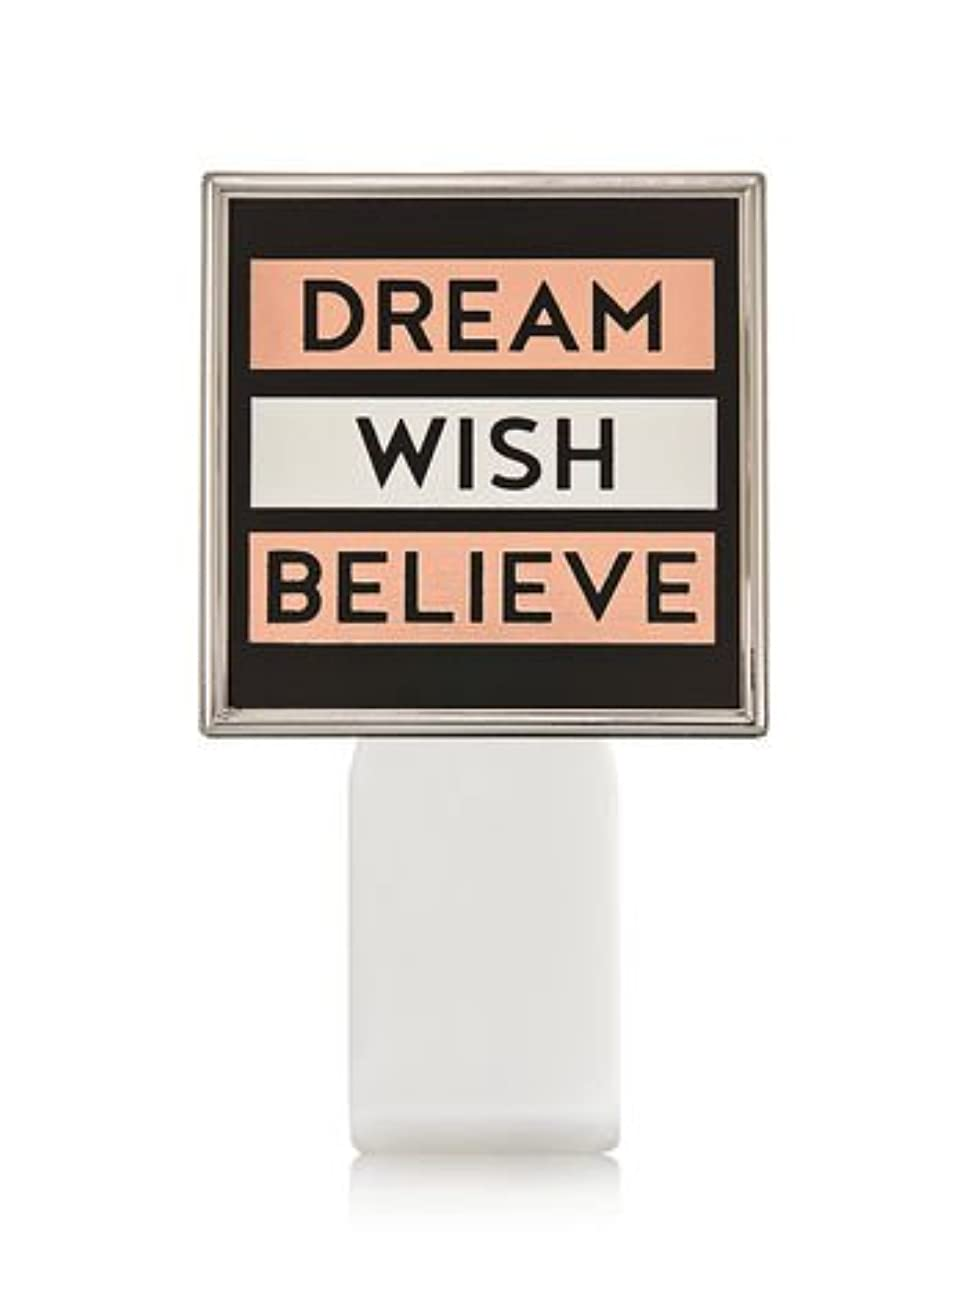 【Bath&Body Works/バス&ボディワークス】 ルームフレグランス プラグインスターター (本体のみ) ドリーム ウィッシュ ビリーブ Wallflowers Fragrance Plug Dream Wish Believe [並行輸入品]